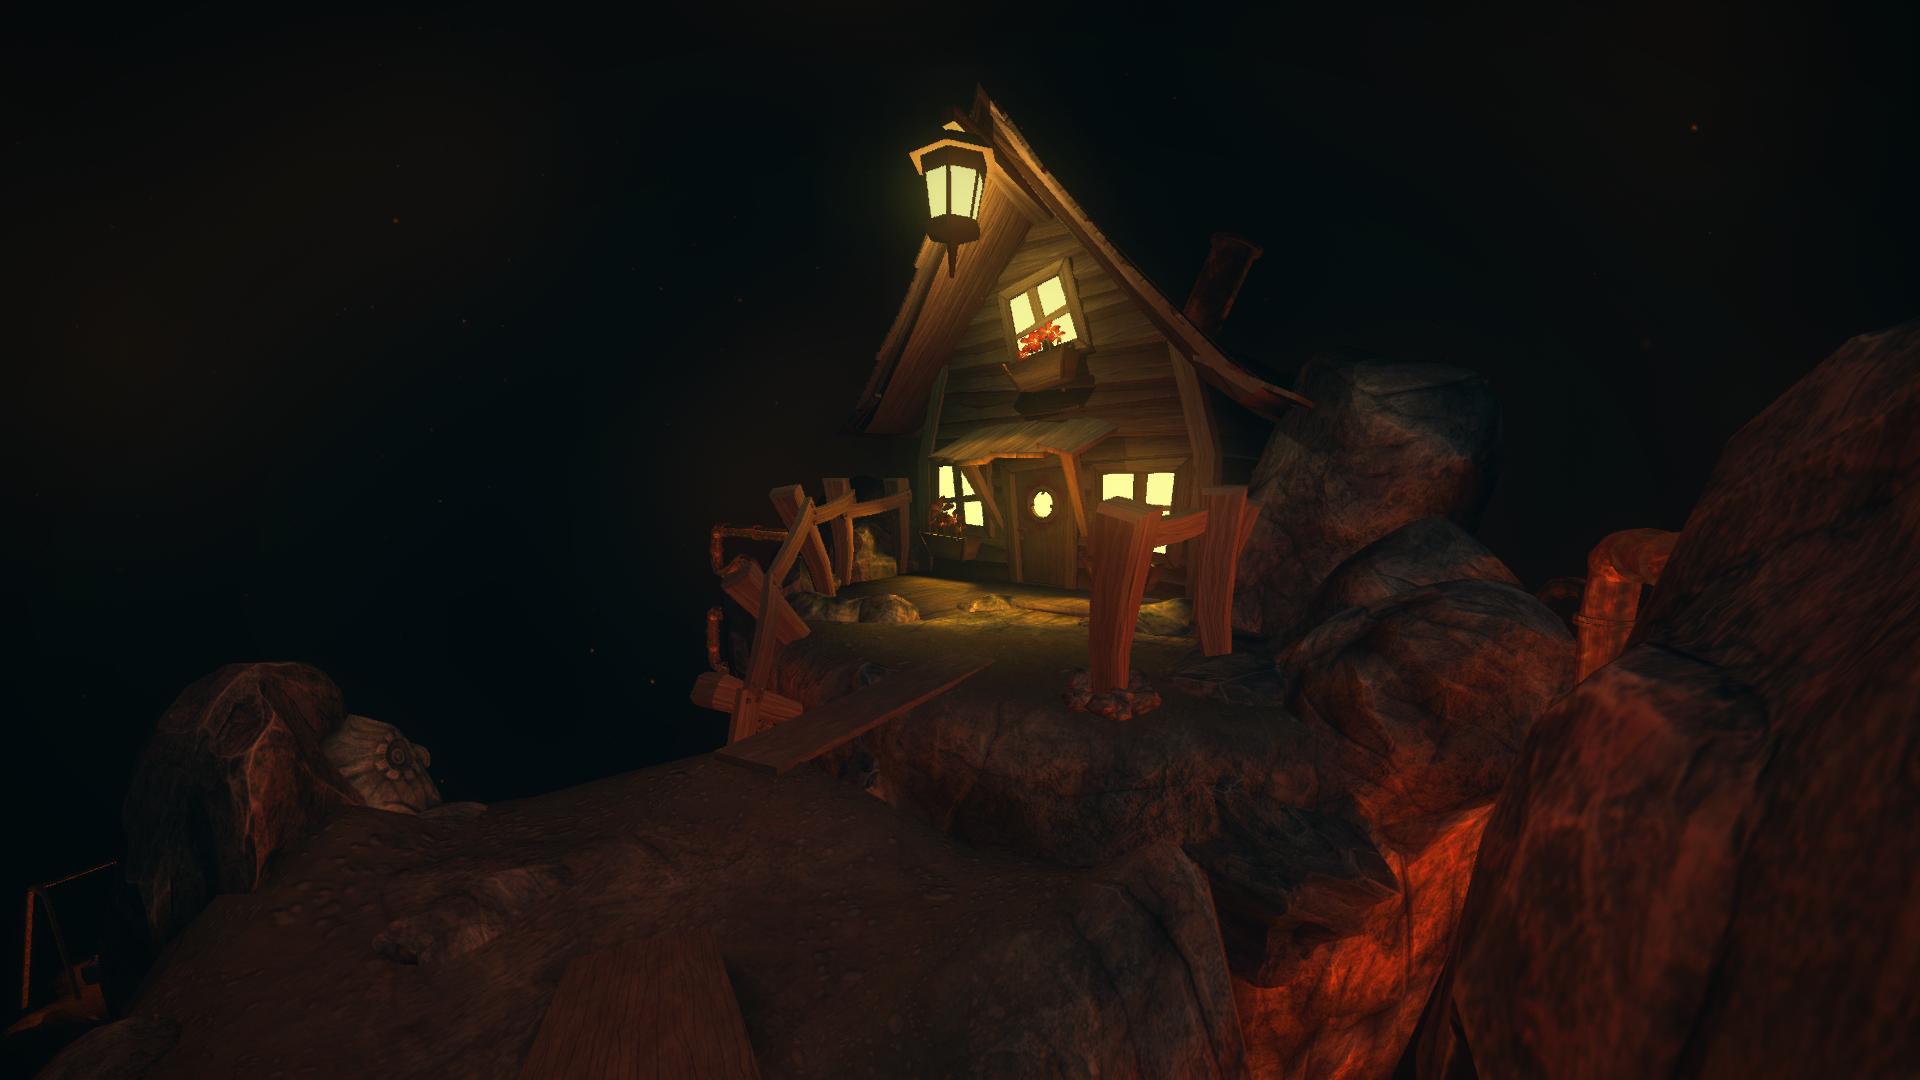 Among the sleep - кошмары наяву - Изображение 2